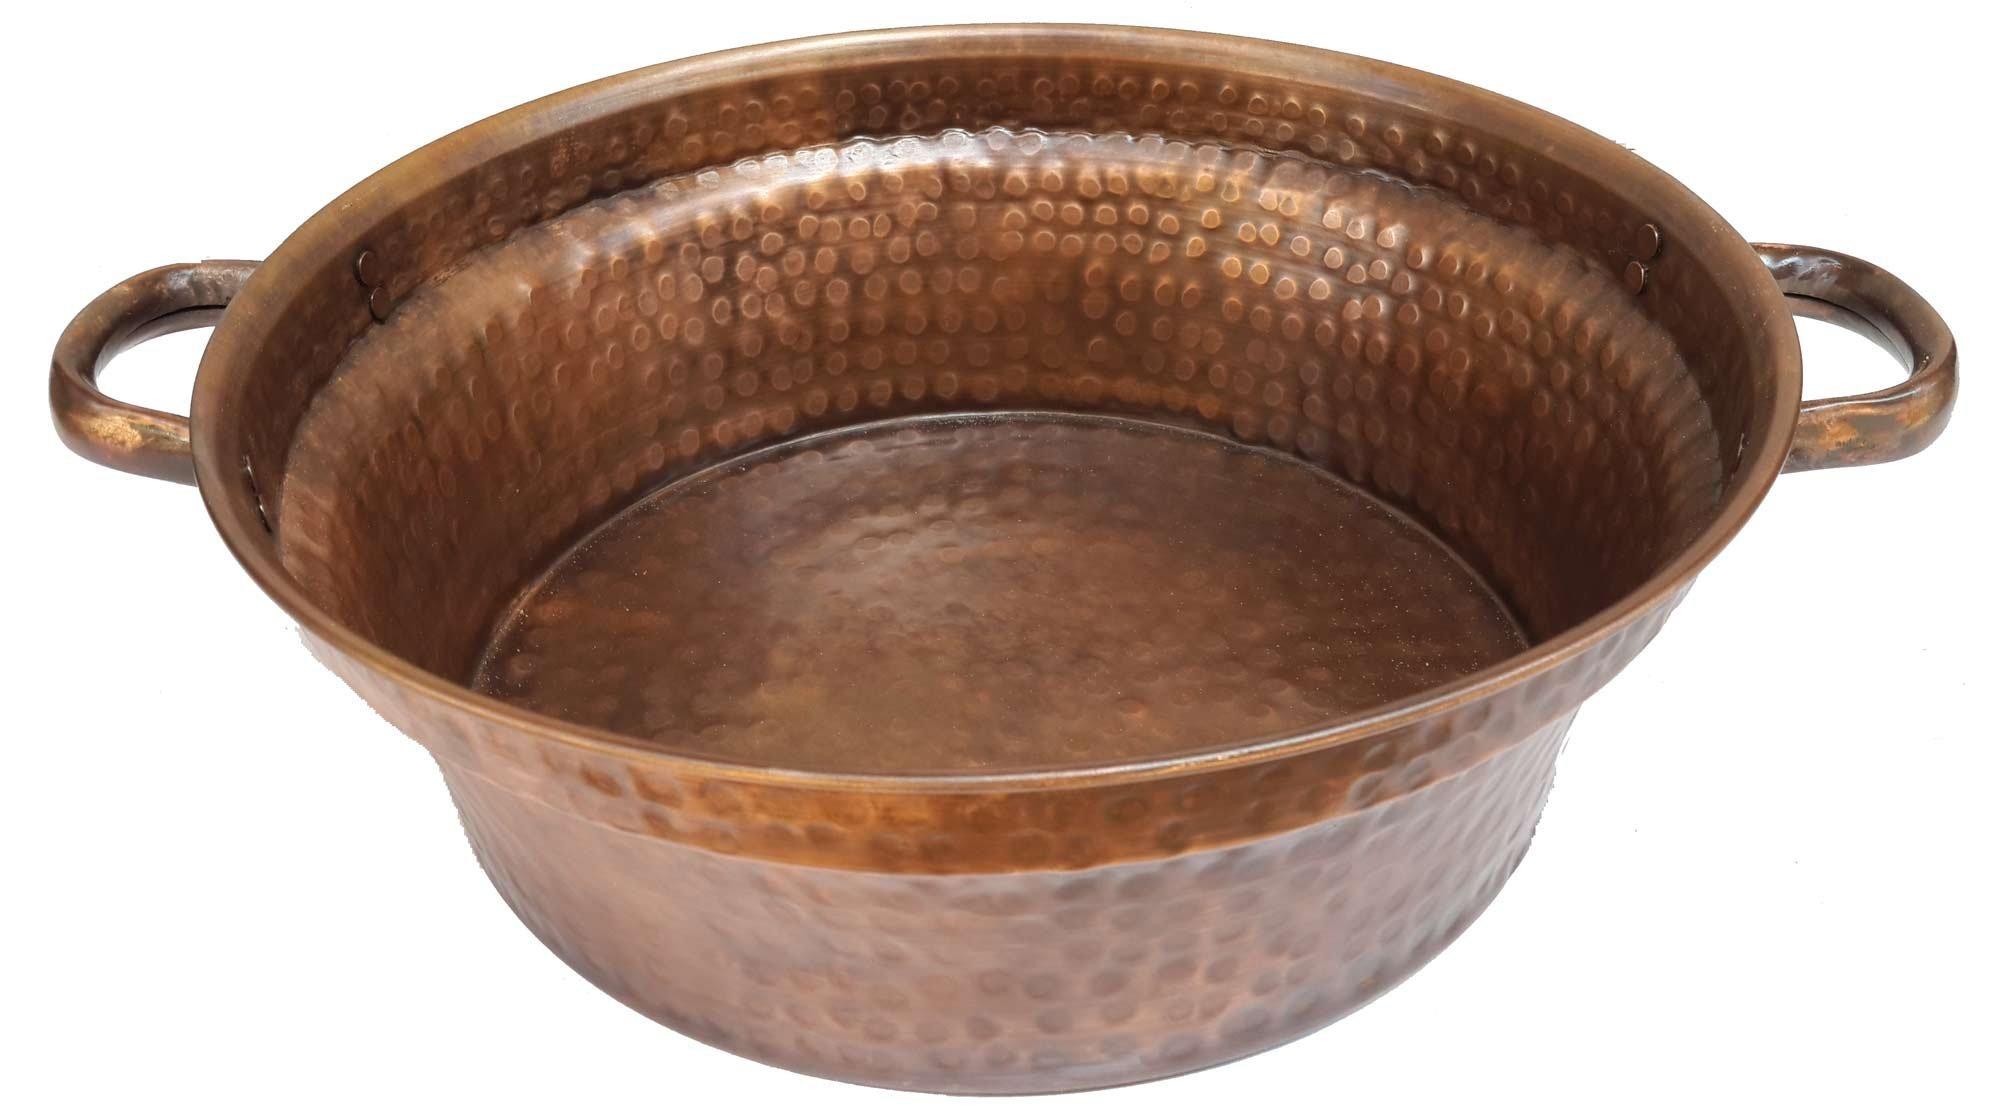 Egypt gift shops 21'' Large Antique Patina Foot Massage Bath Bucket Handles Pedicure Spa Styling Salon Bowl 14'' Bottom